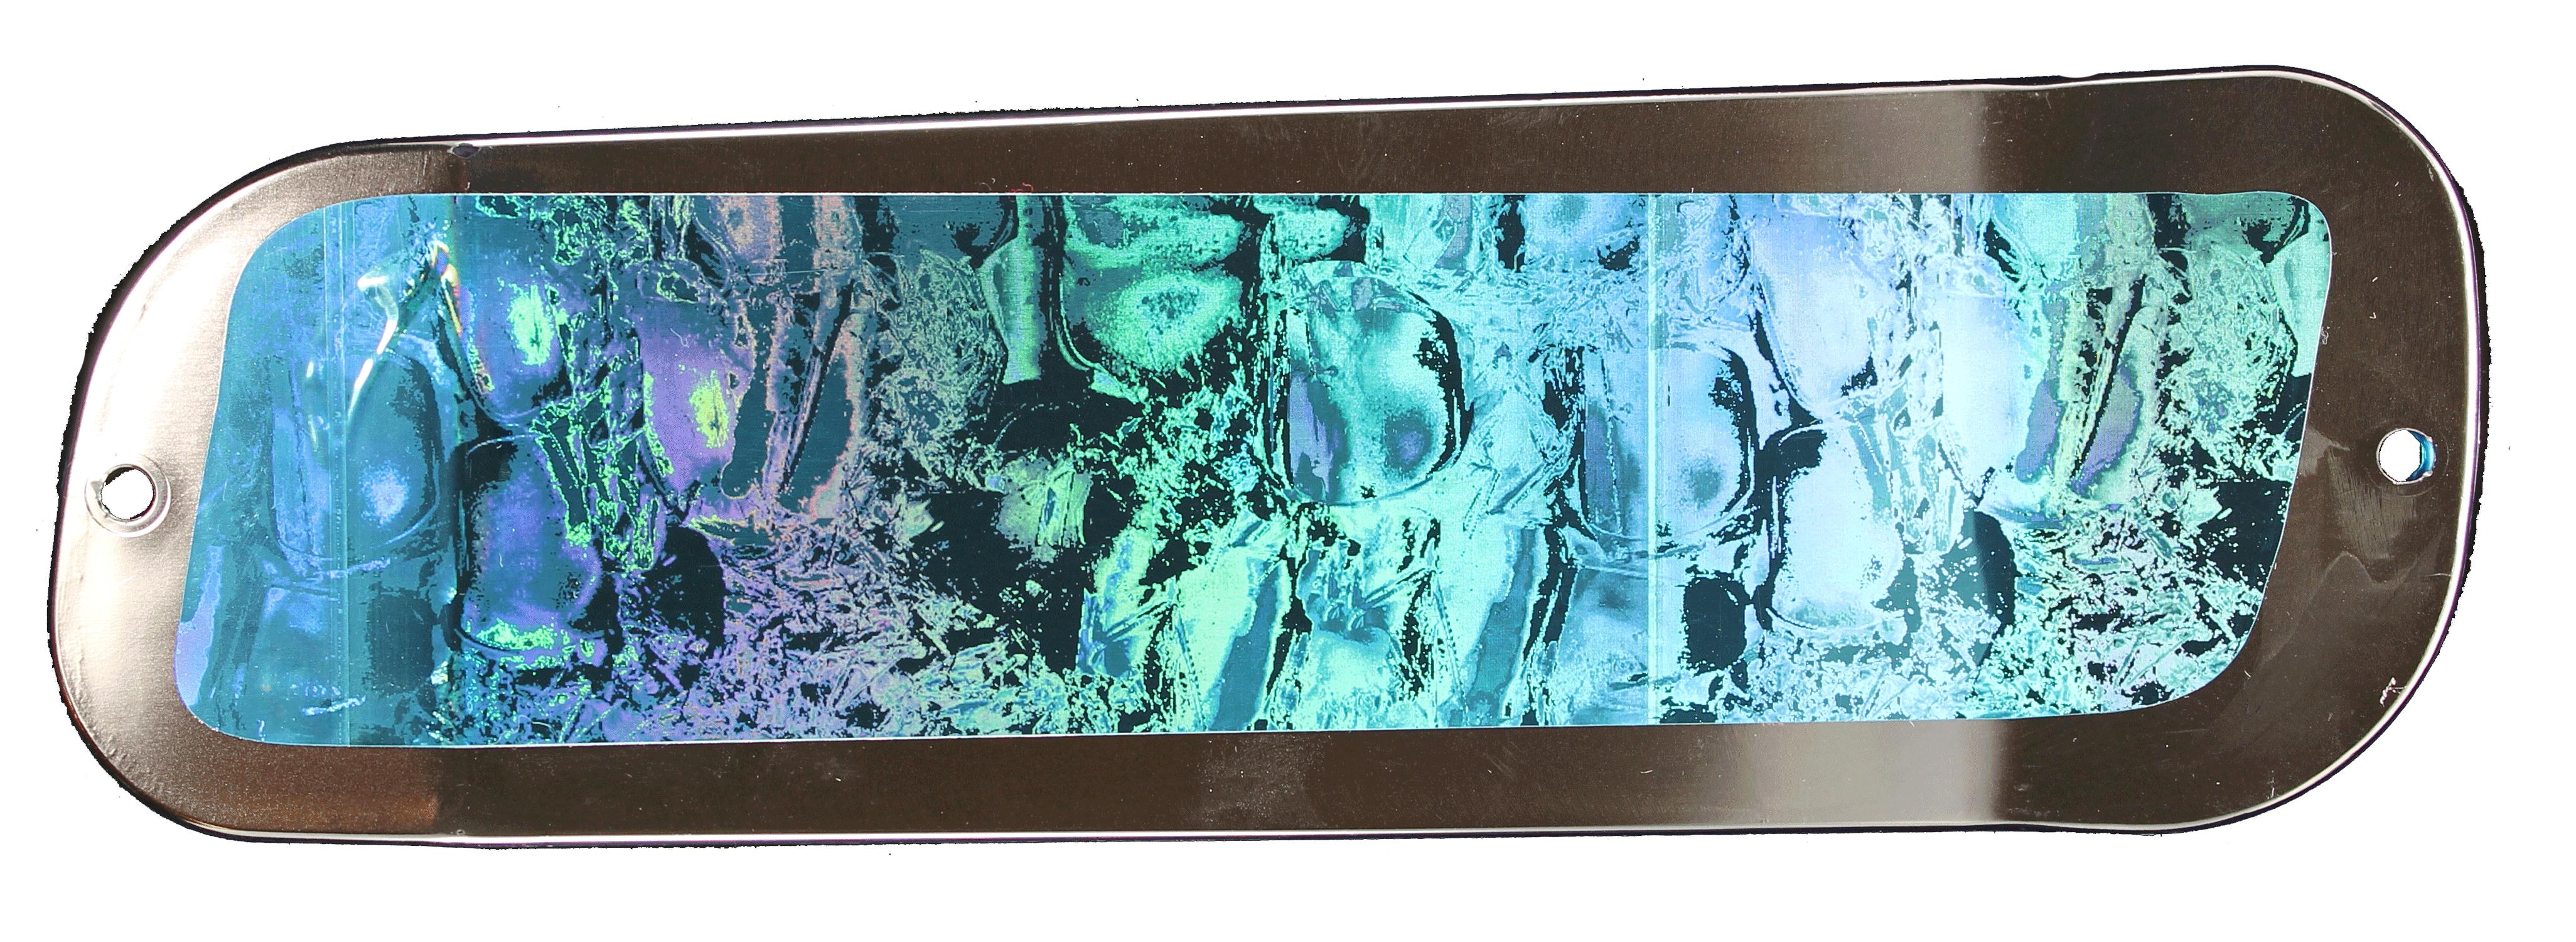 Paddle 11 – Chrome-Blue/Blue